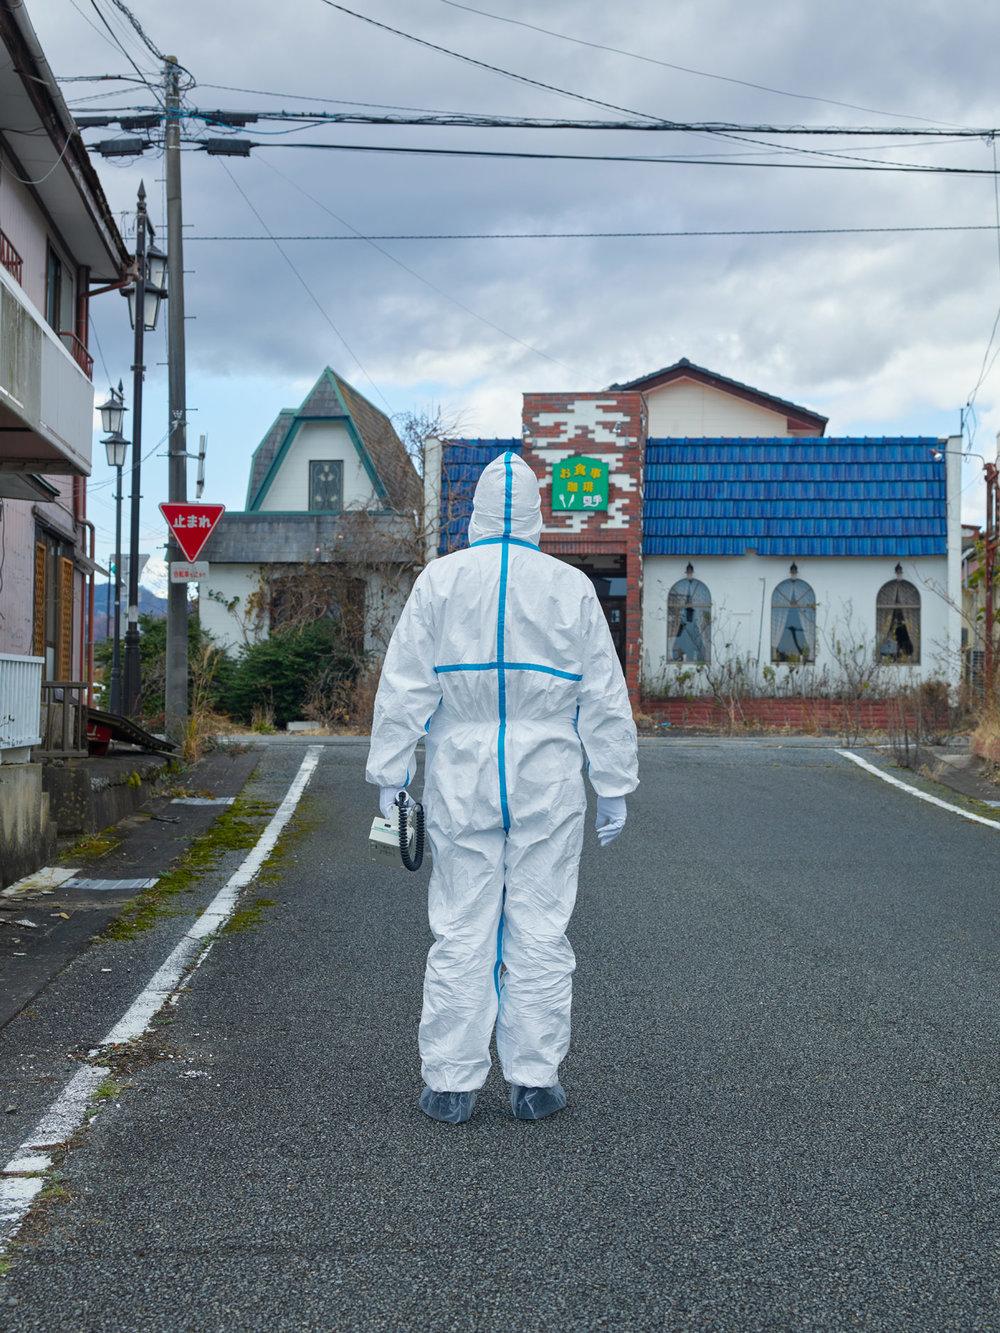 wired_fukashima_exclusion_zone_053.jpg